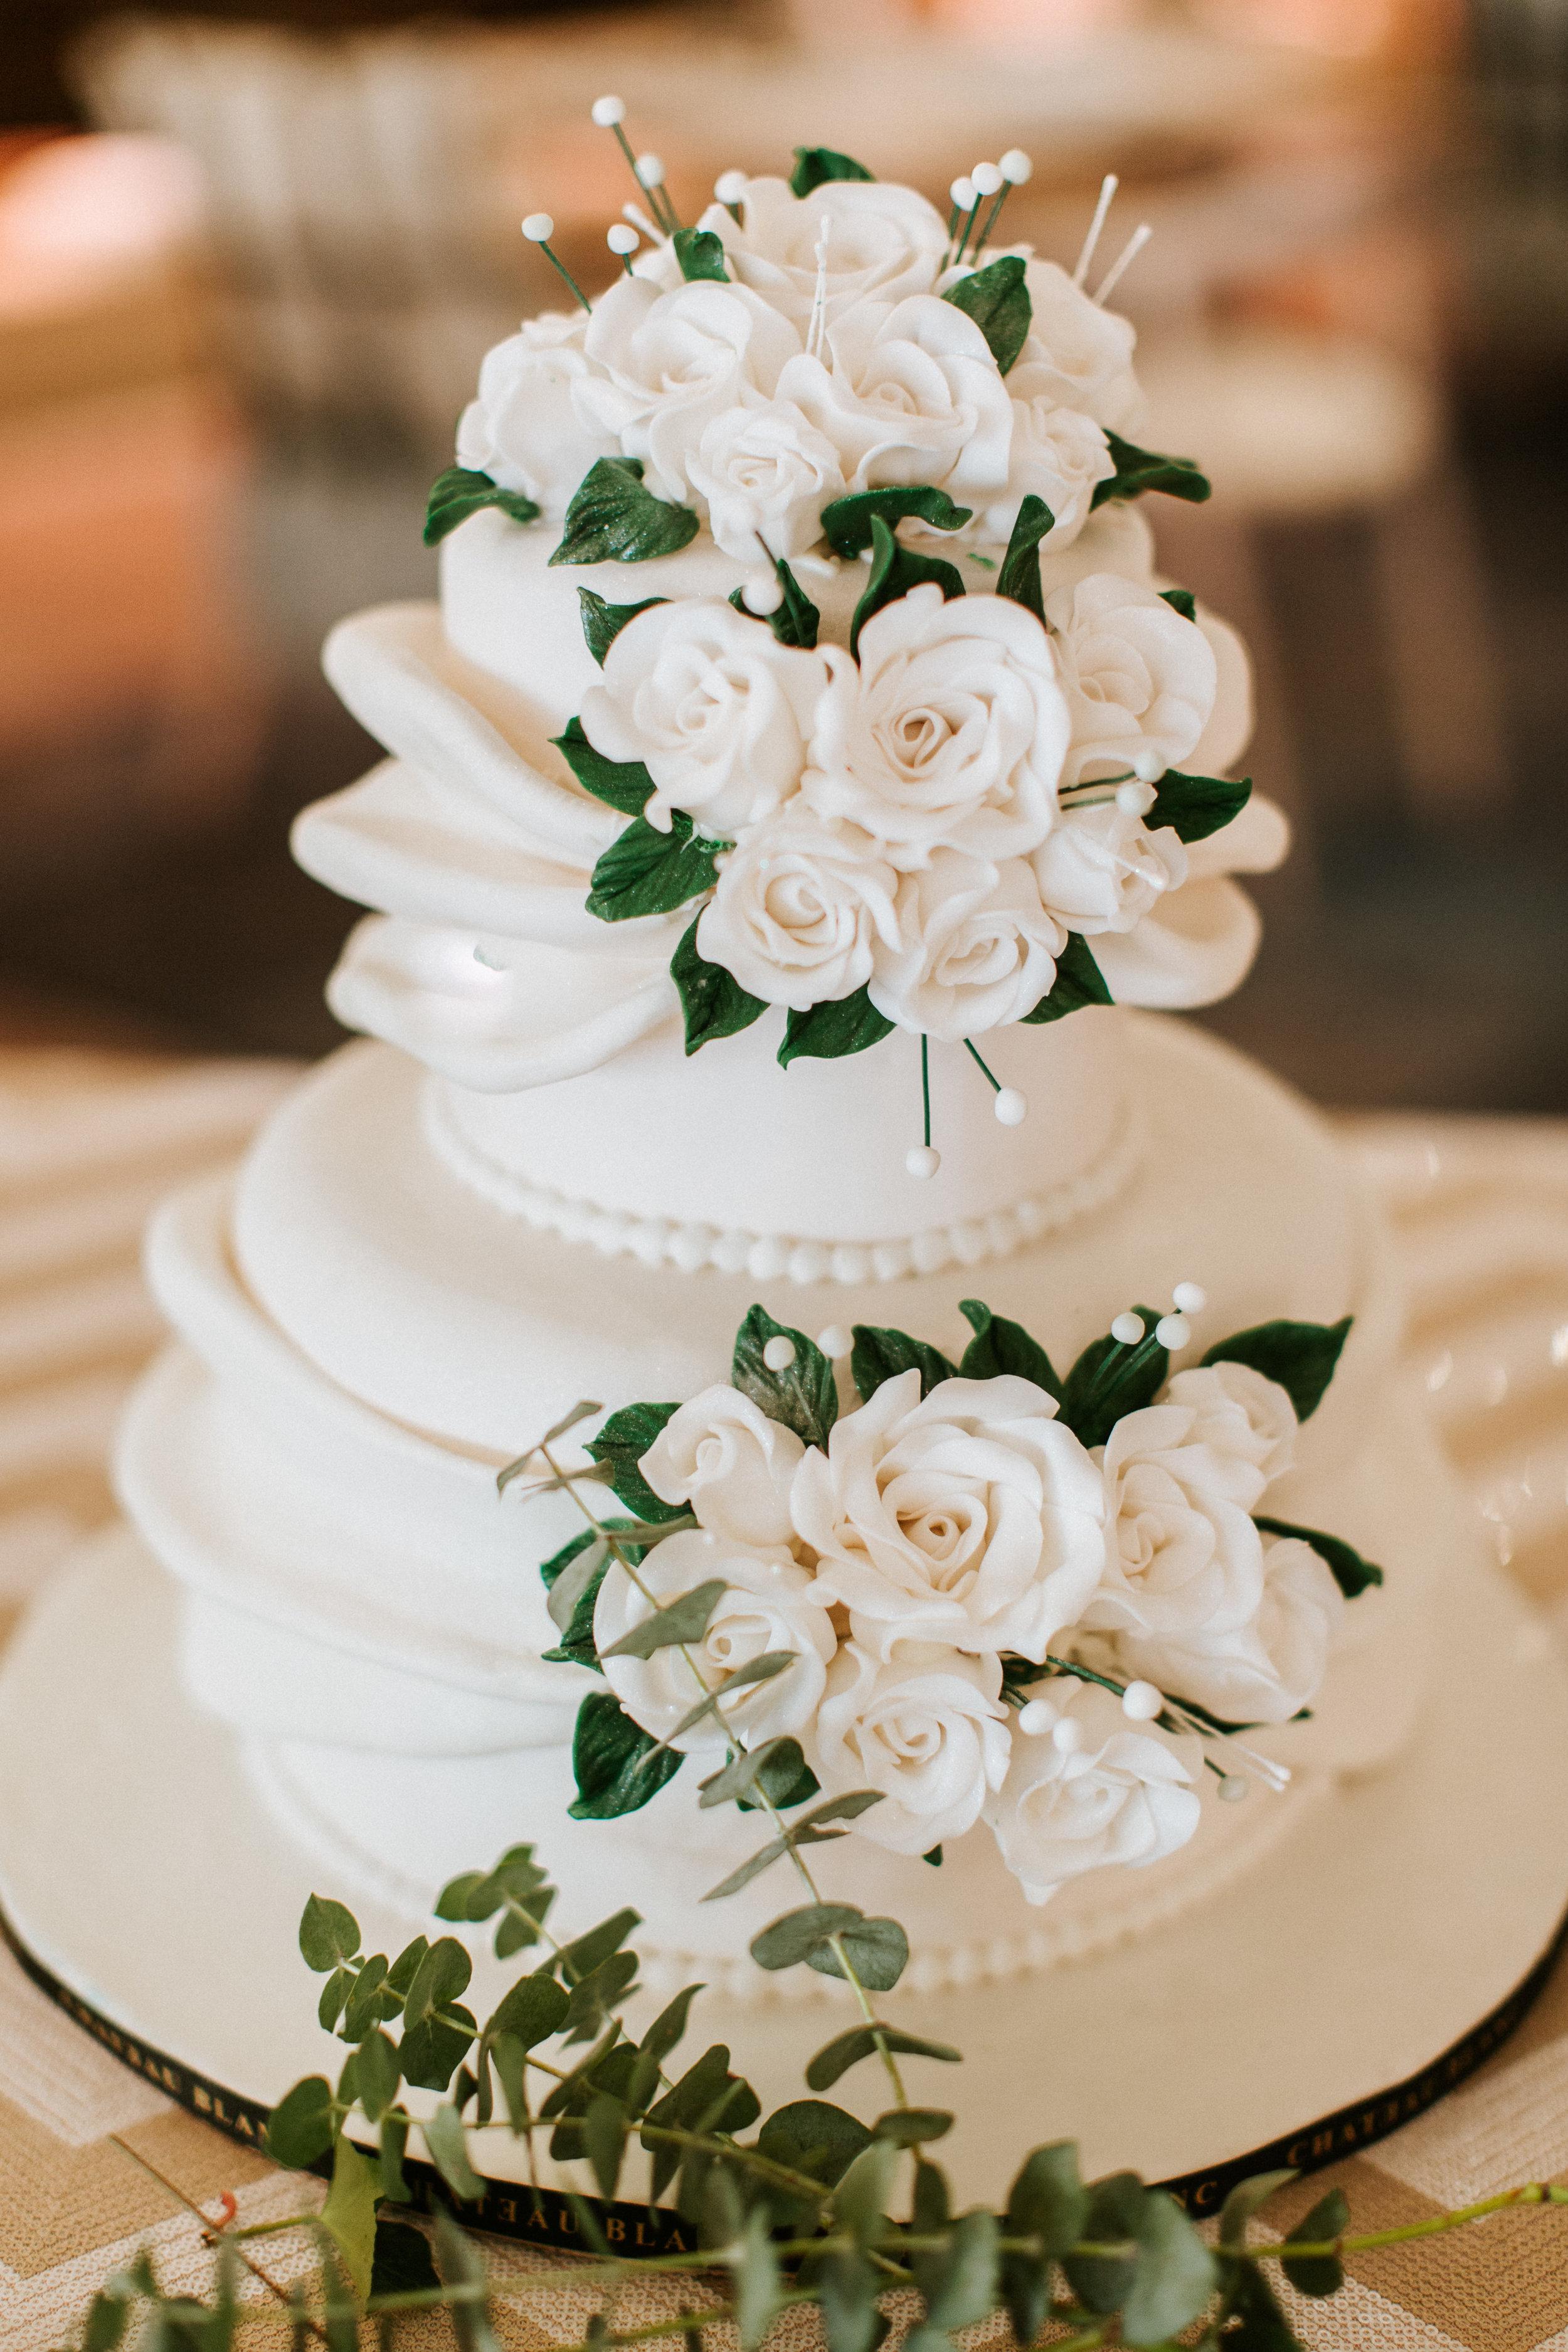 Simple White Wedding Cake - Blue Blanc Dubai Wedding